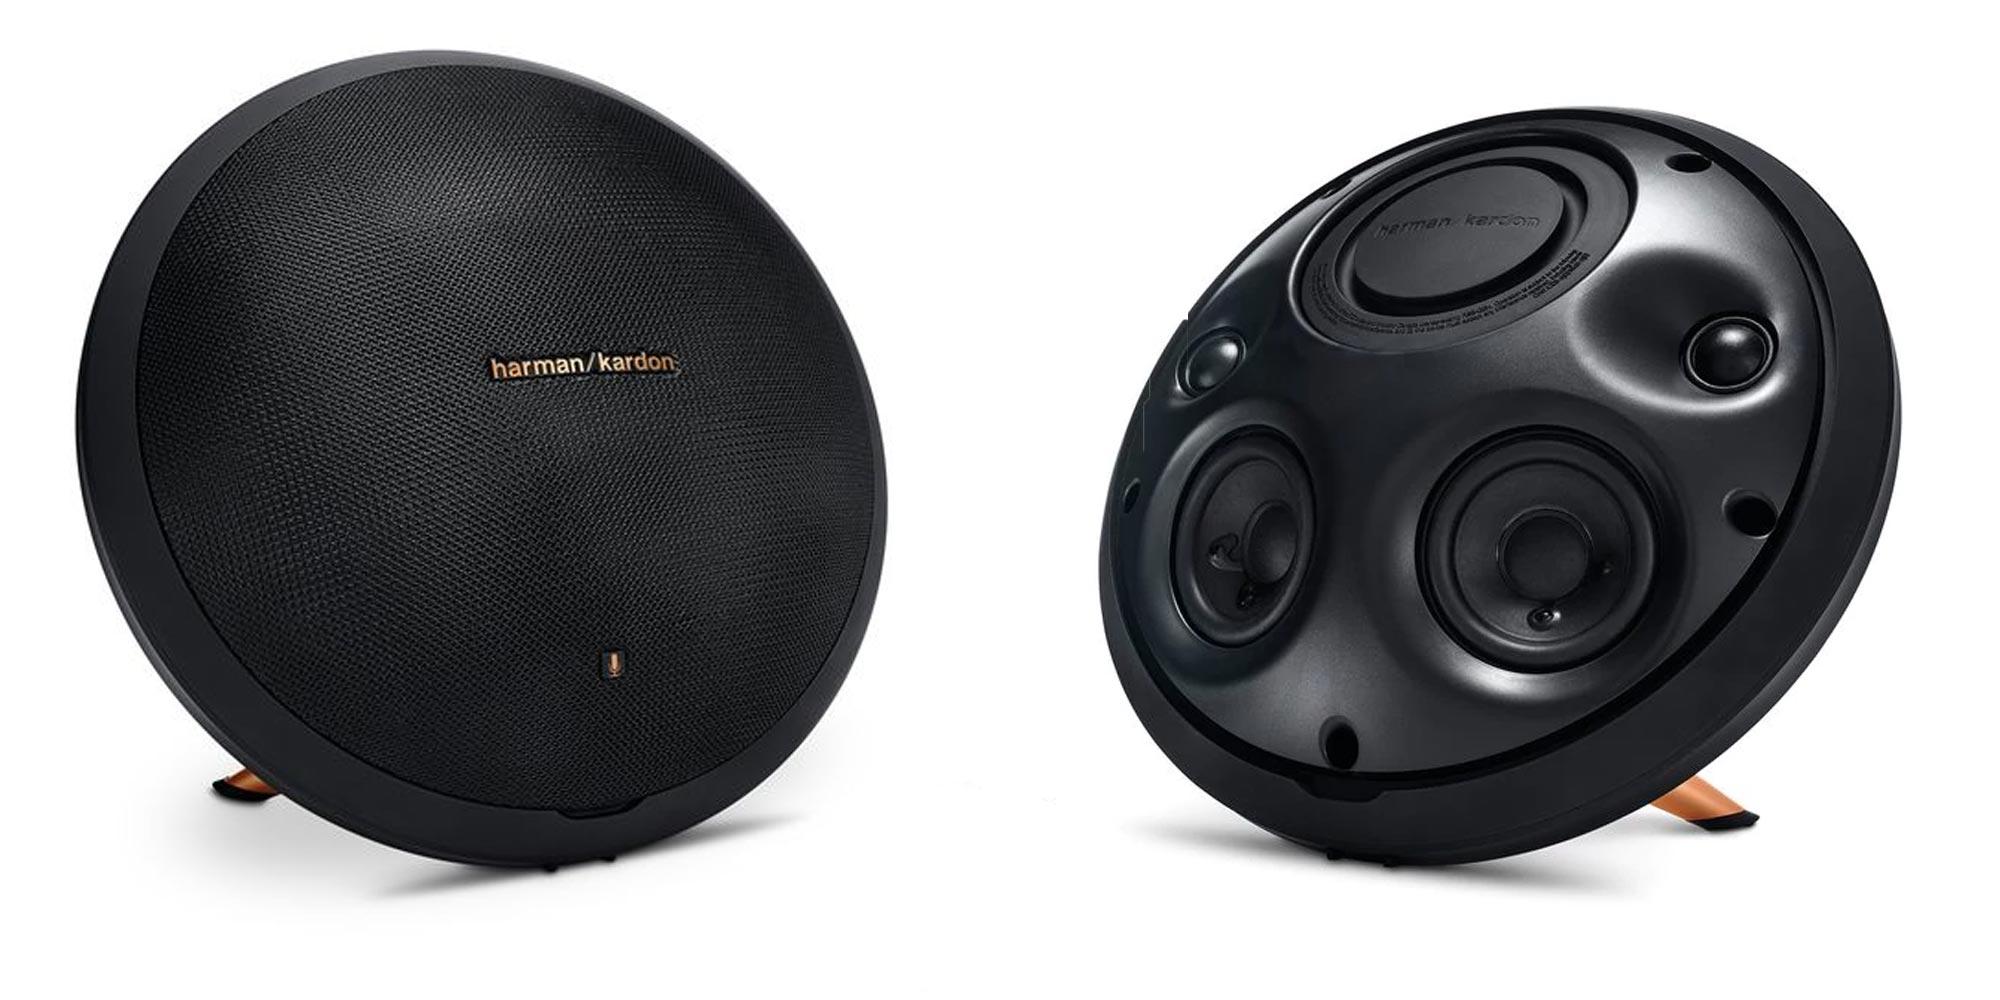 Harman Kardon's Onyx Studio 2 Bluetooth speaker drops to $75